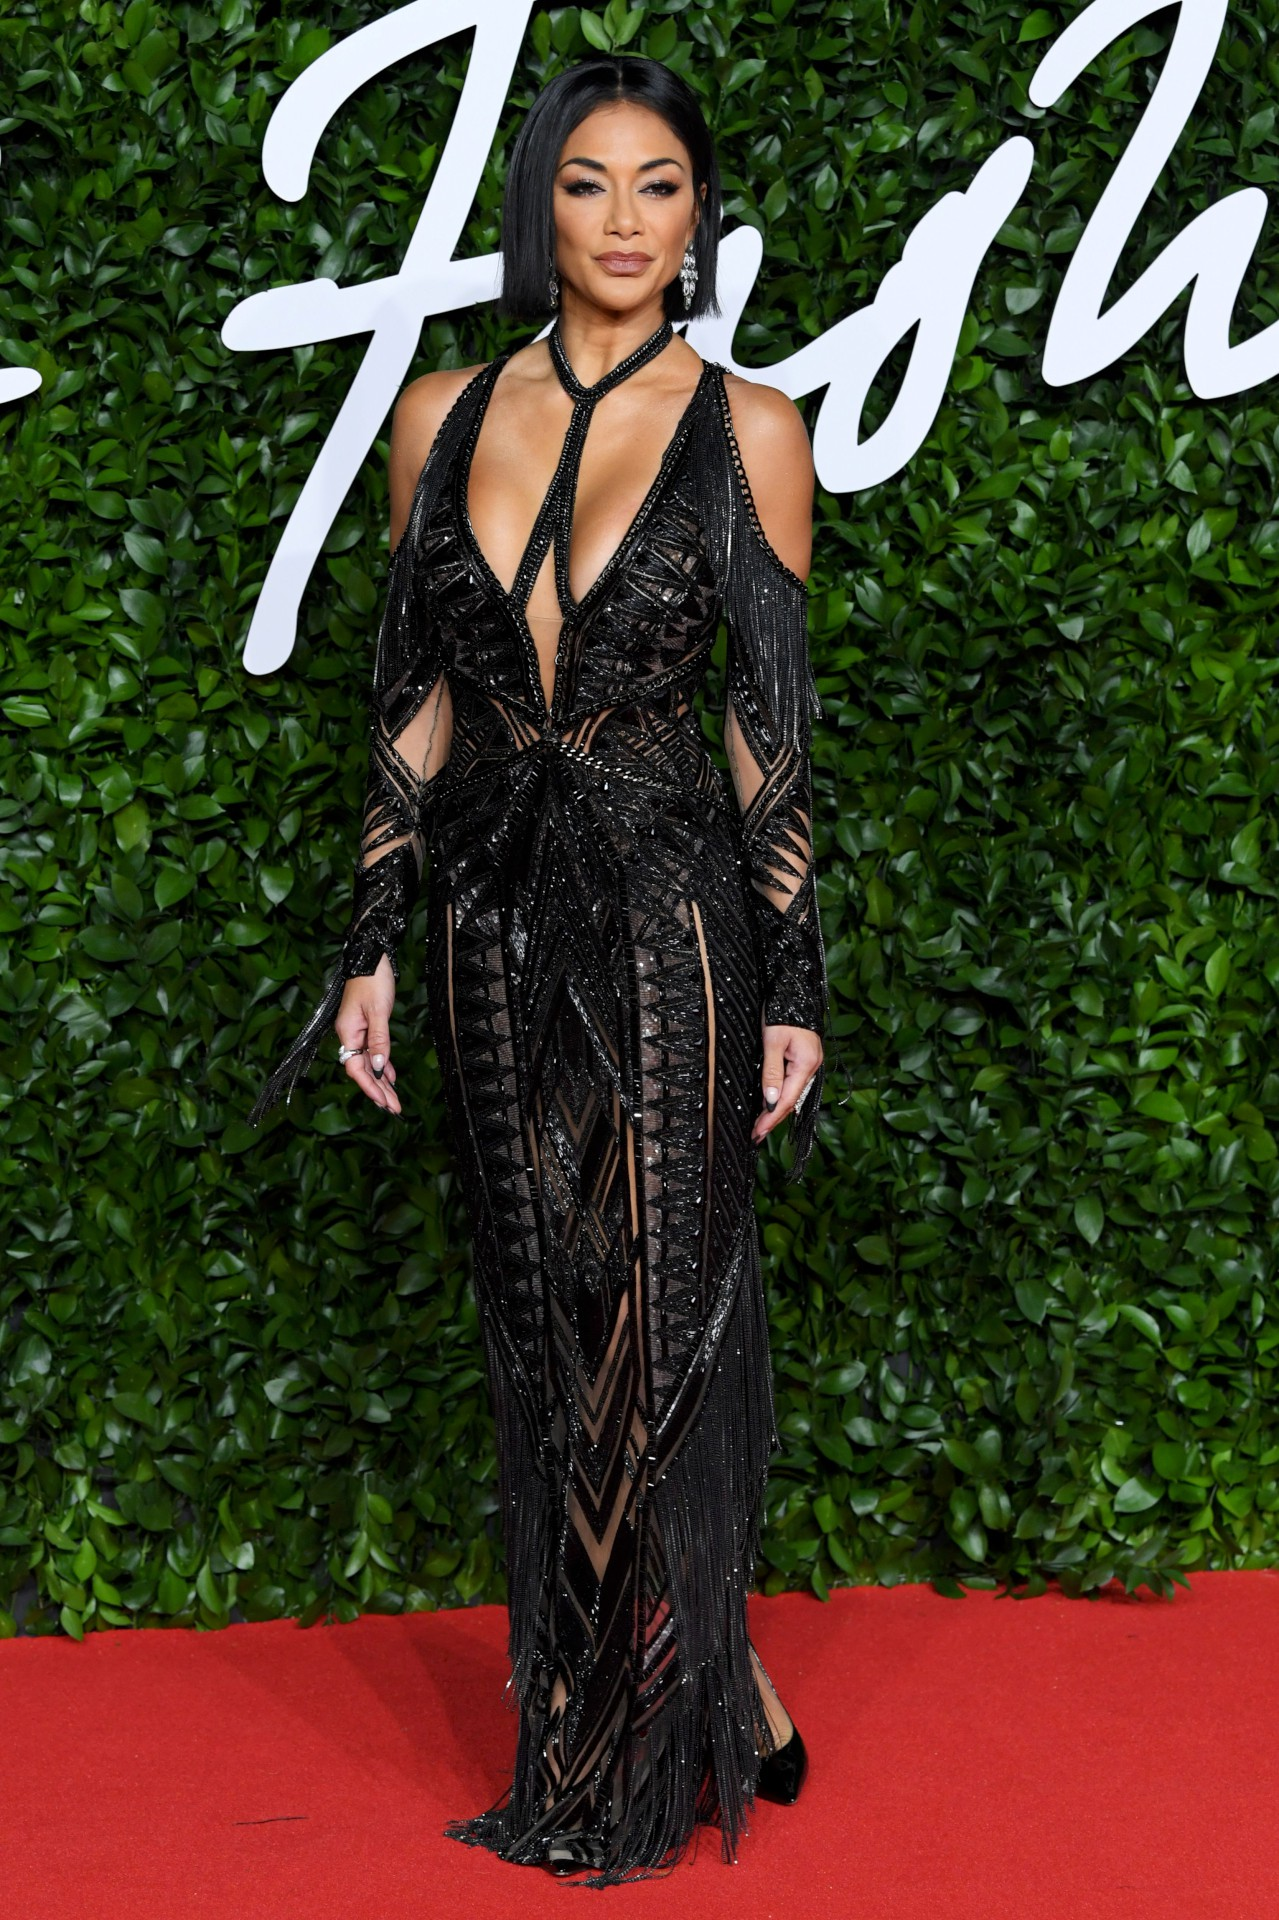 Nicole Scherzinger Sexy Boobs In Big Cleavage - Hot Celebs Home